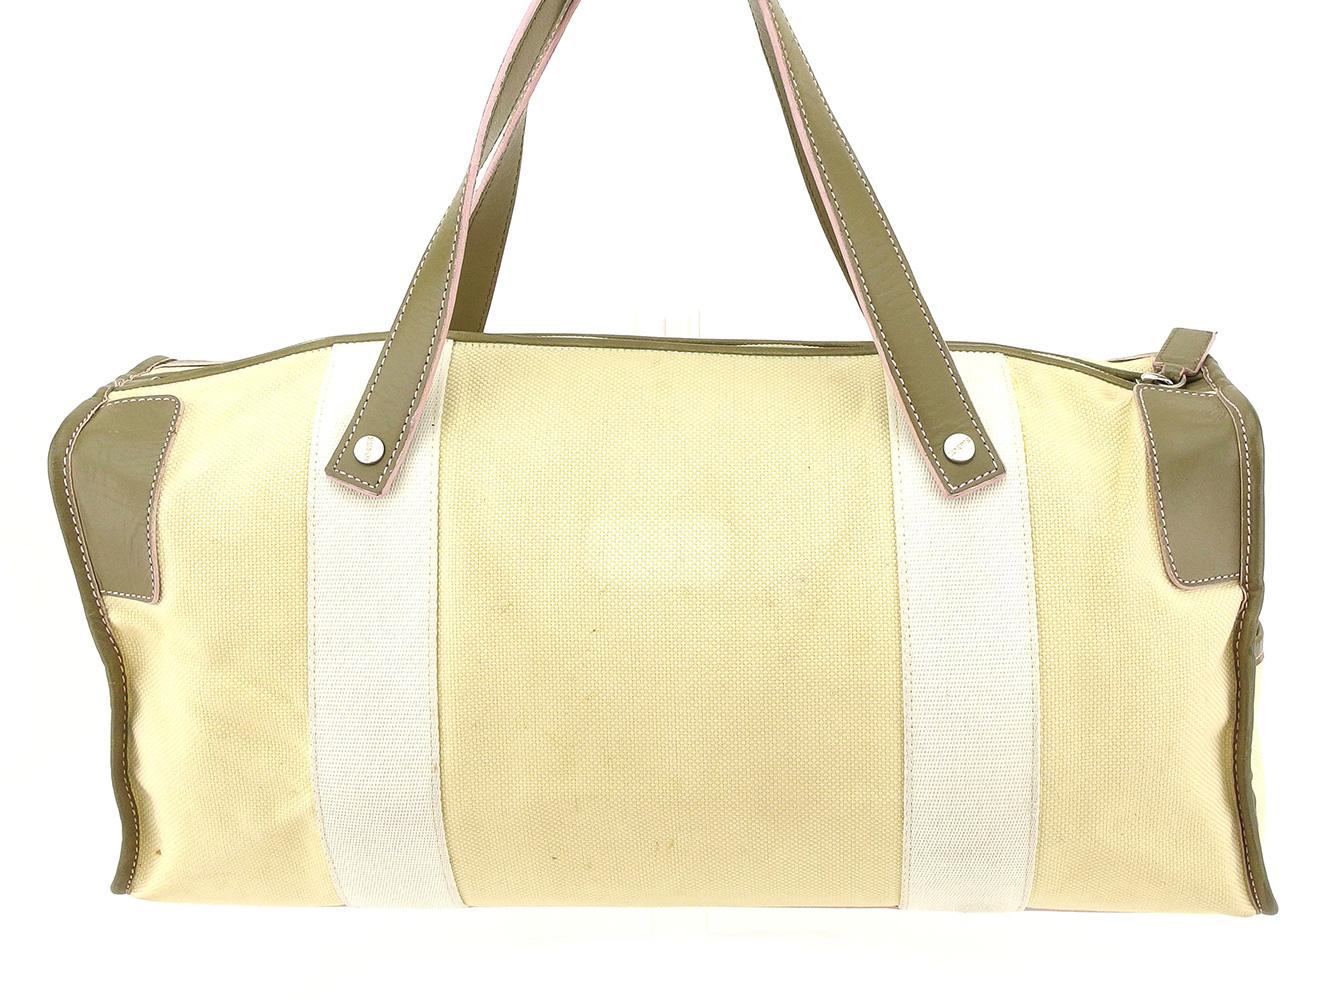 Loewe LOEWE handbag mini-Boston bag Lady s logogriph beige green white  White Russian canvas X leather popularity sale T7787 df91674735b03